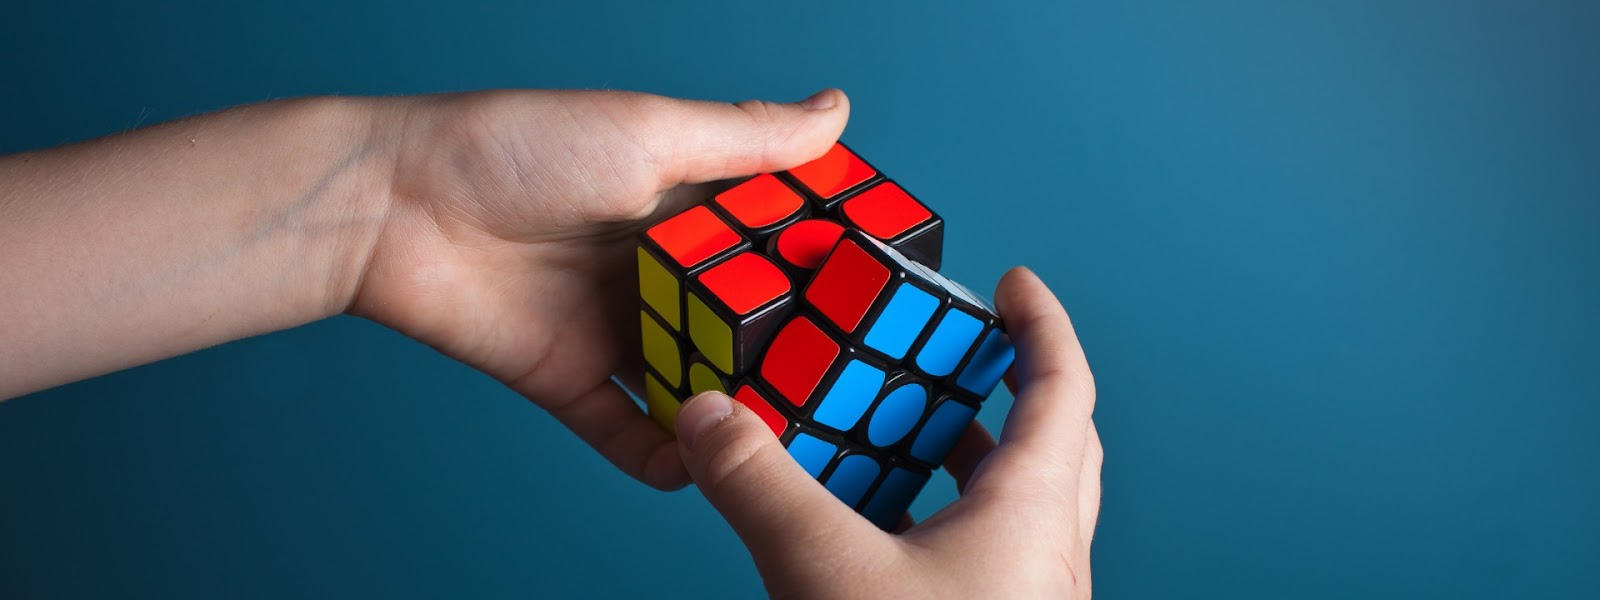 Intrapreneurial employee trait: problem solving